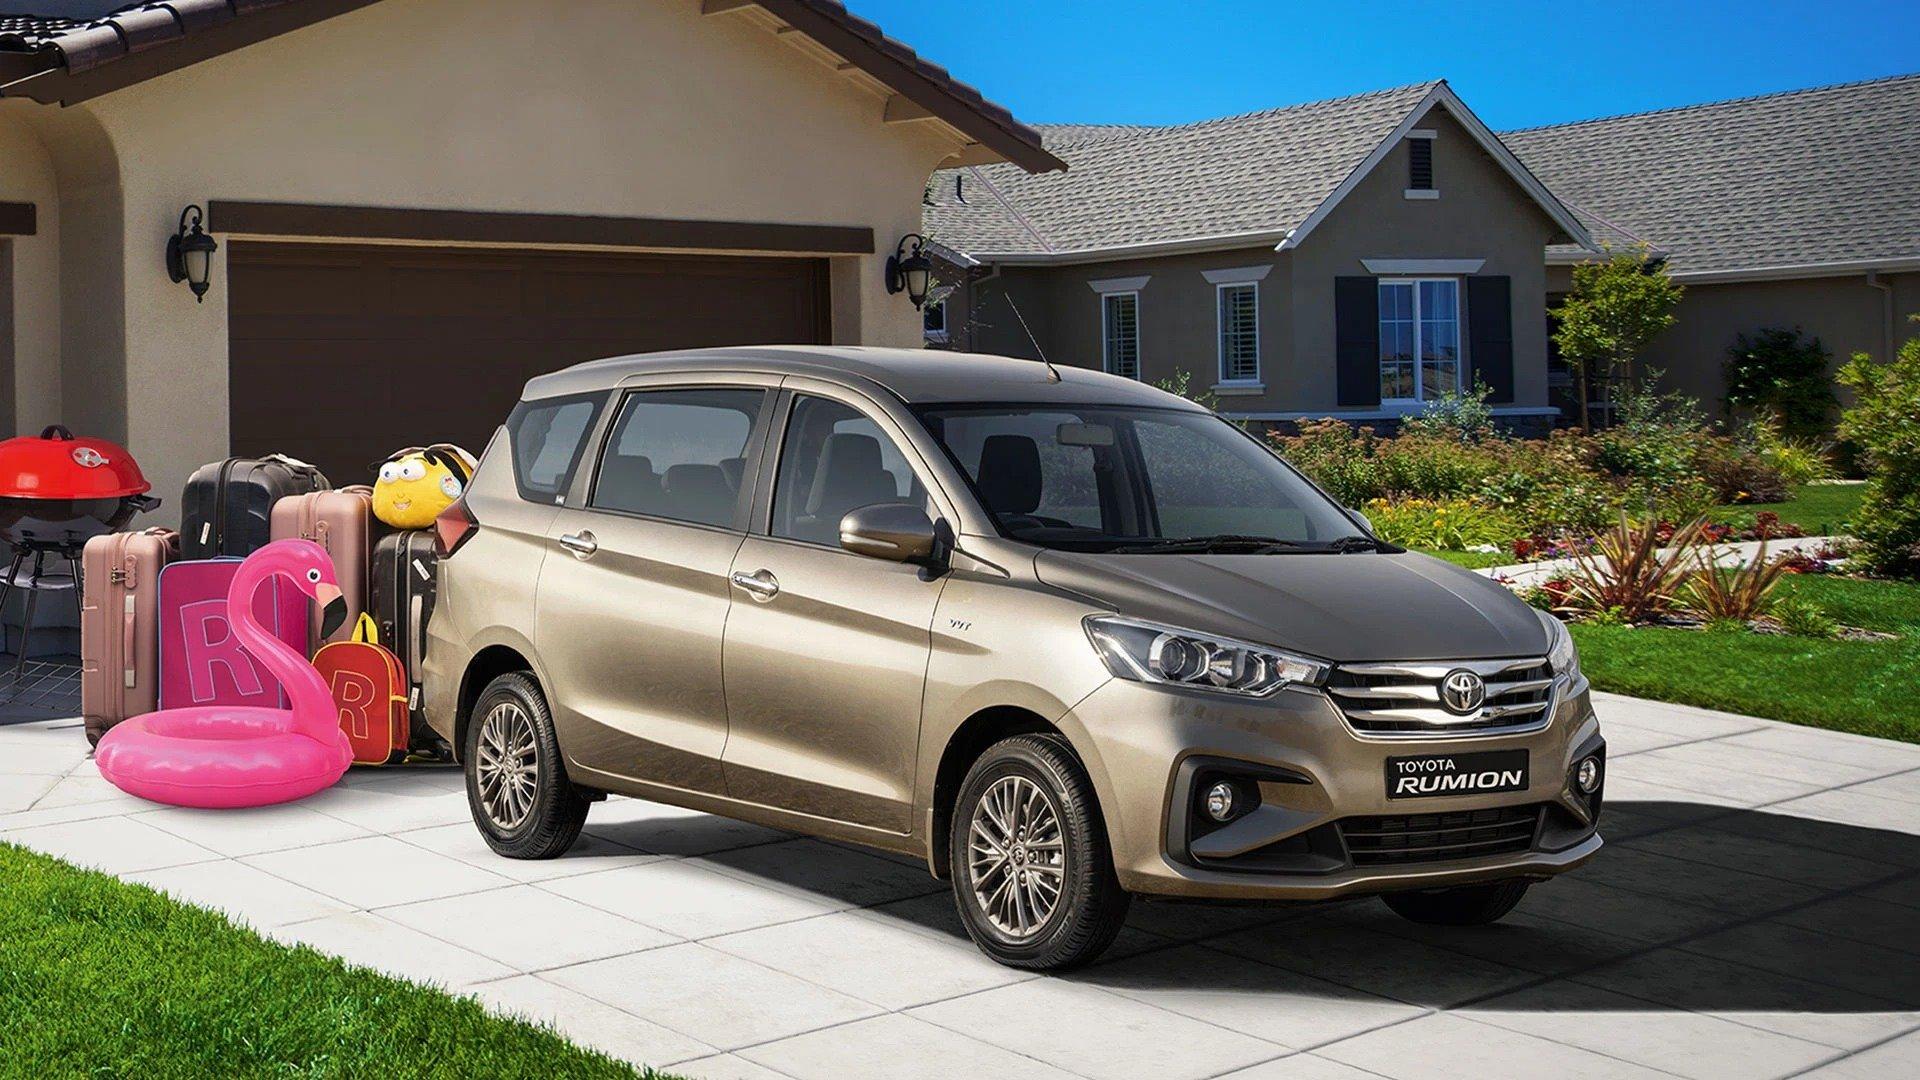 Tin xe hot nhất 13/10: Ra mắt Toyota Rumion - Suzuki Ertiga, Ảnh thực tế Kia Telluride 1